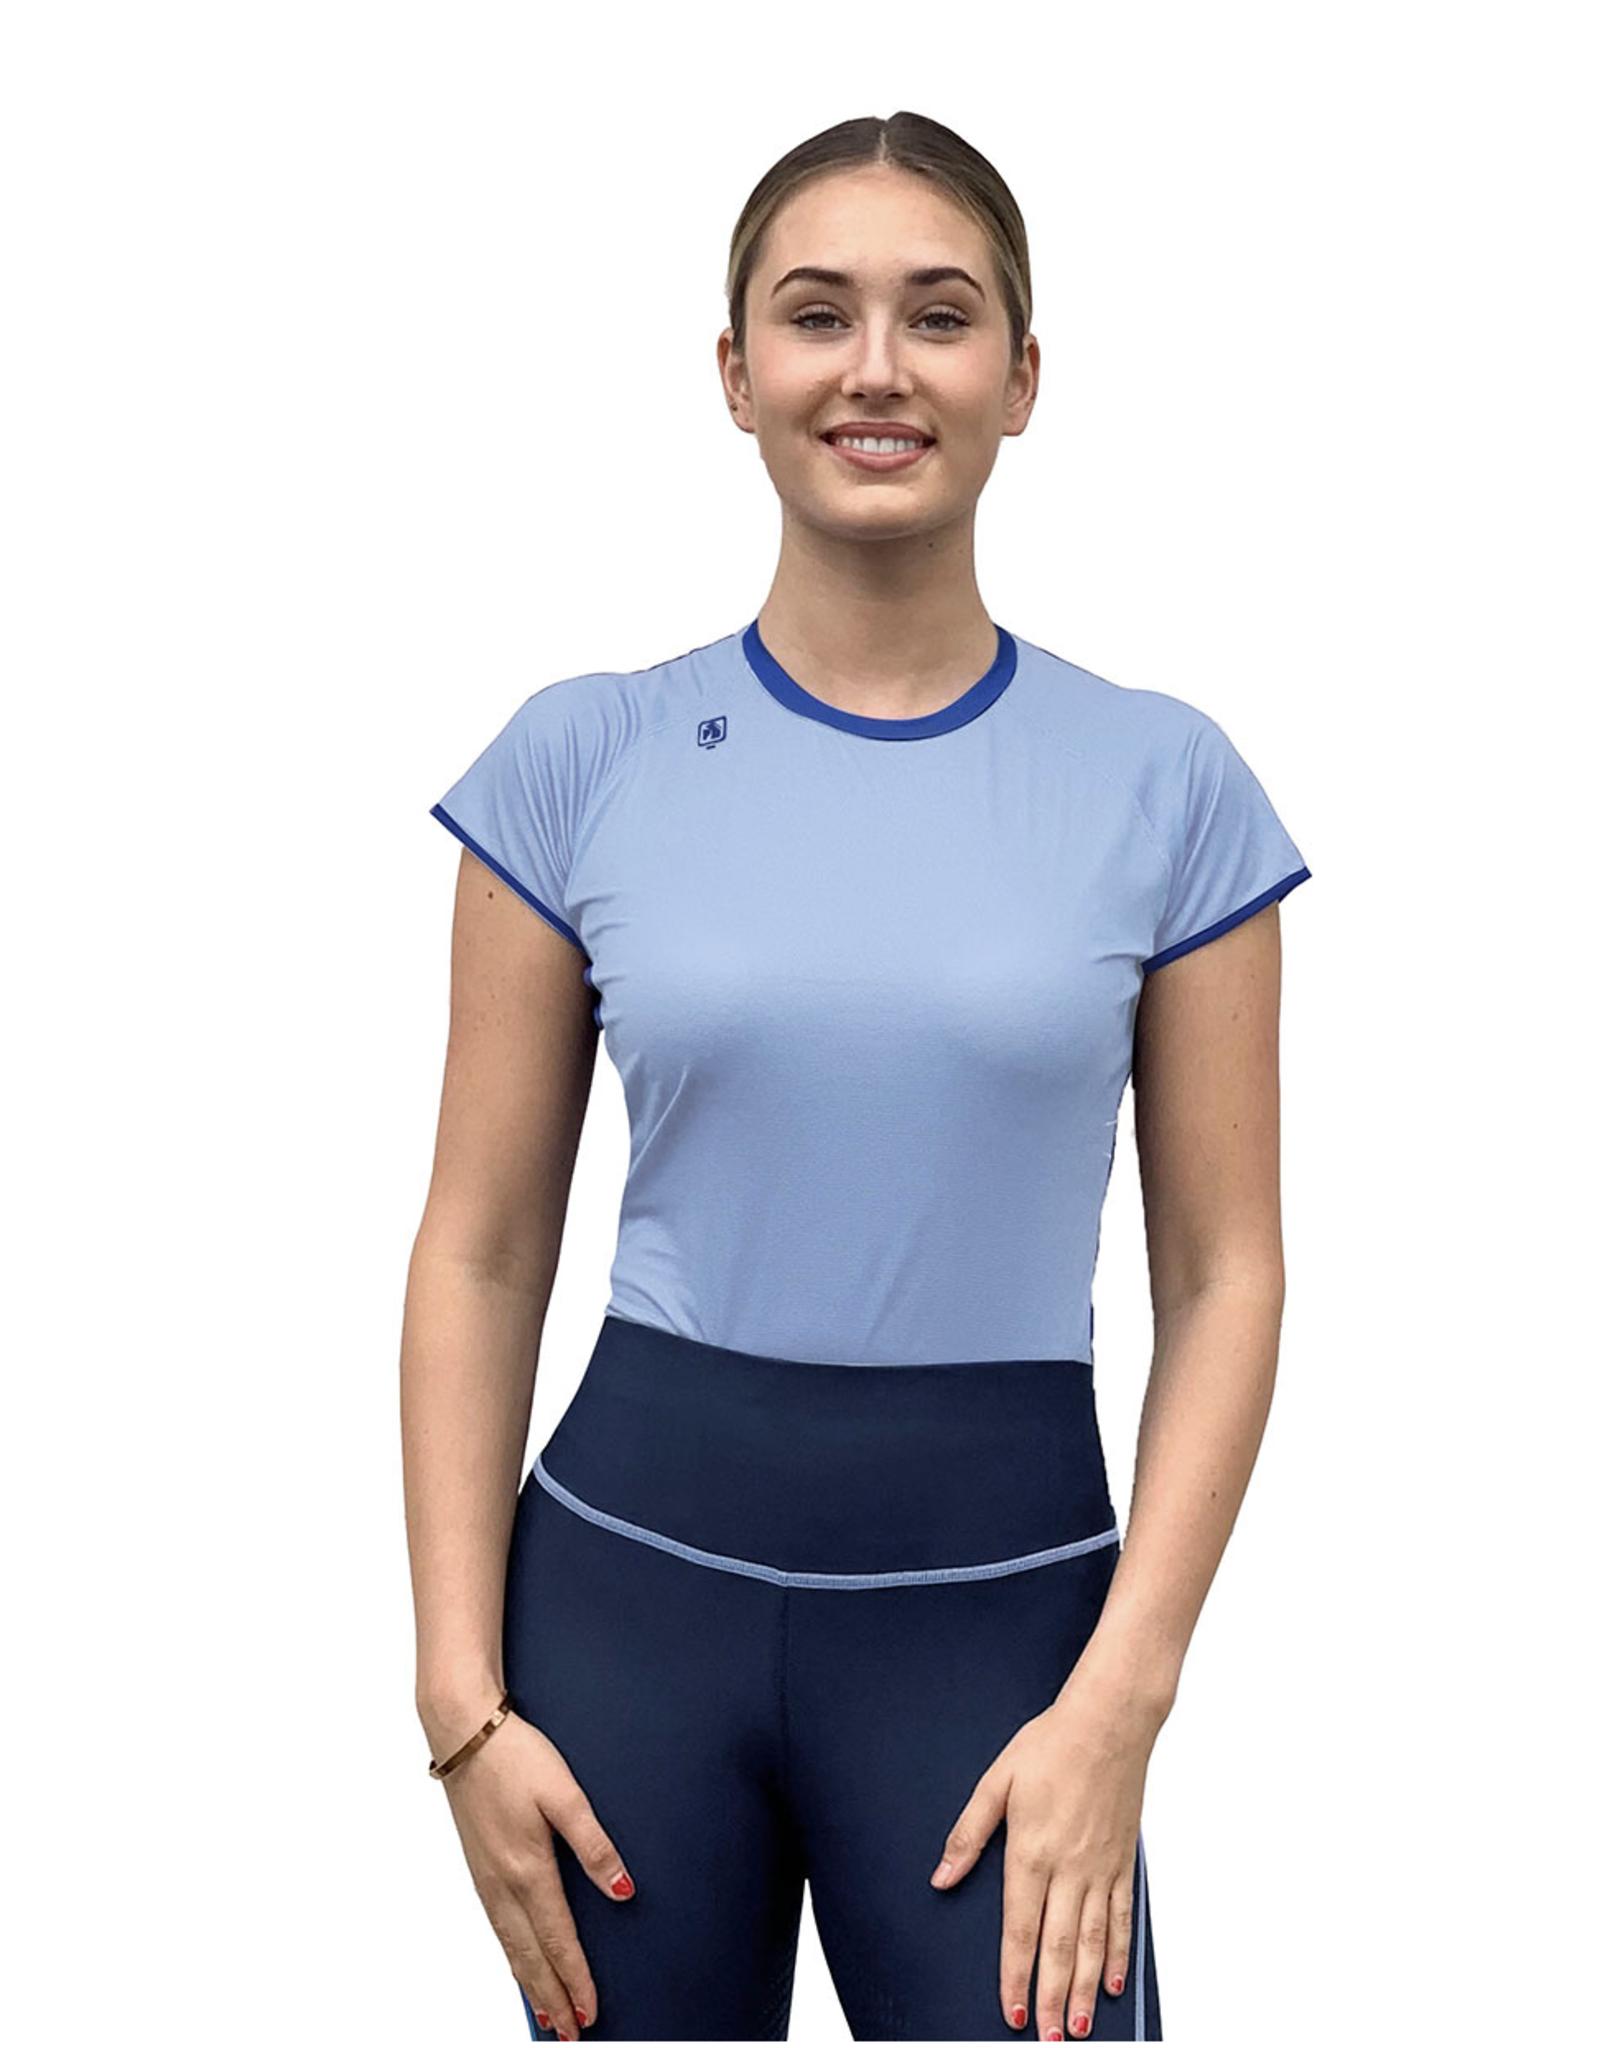 Romfh Ladies' Lucy Tech Short Sleeve Shirt